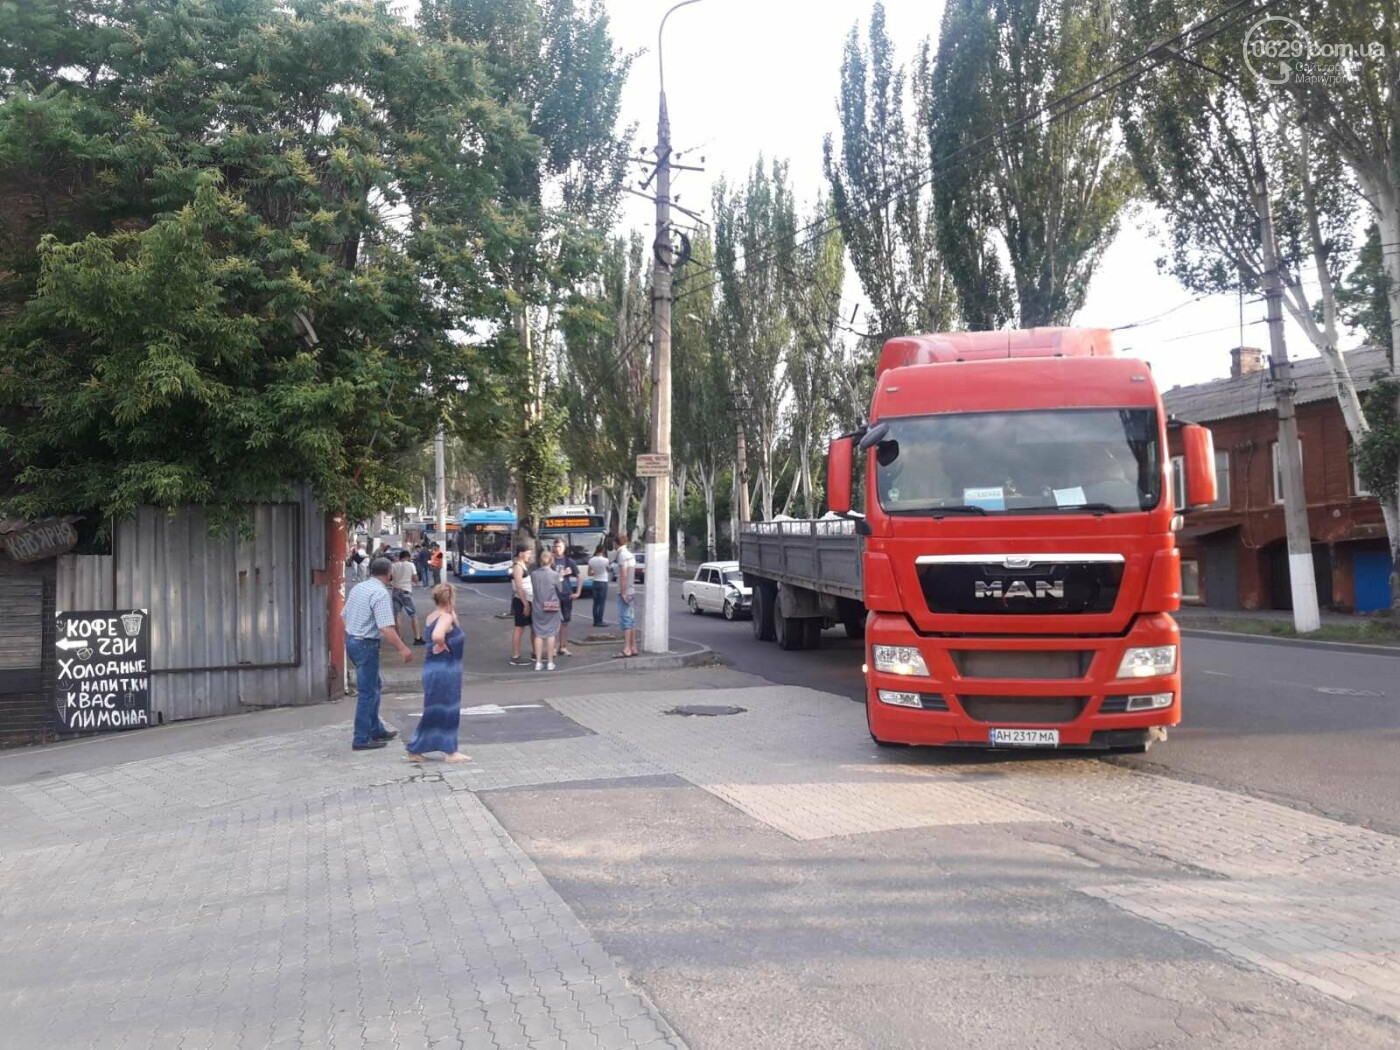 В Мариуполе «копейка» влетела в грузовик. Пострадала девушка, - ФОТО, фото-6